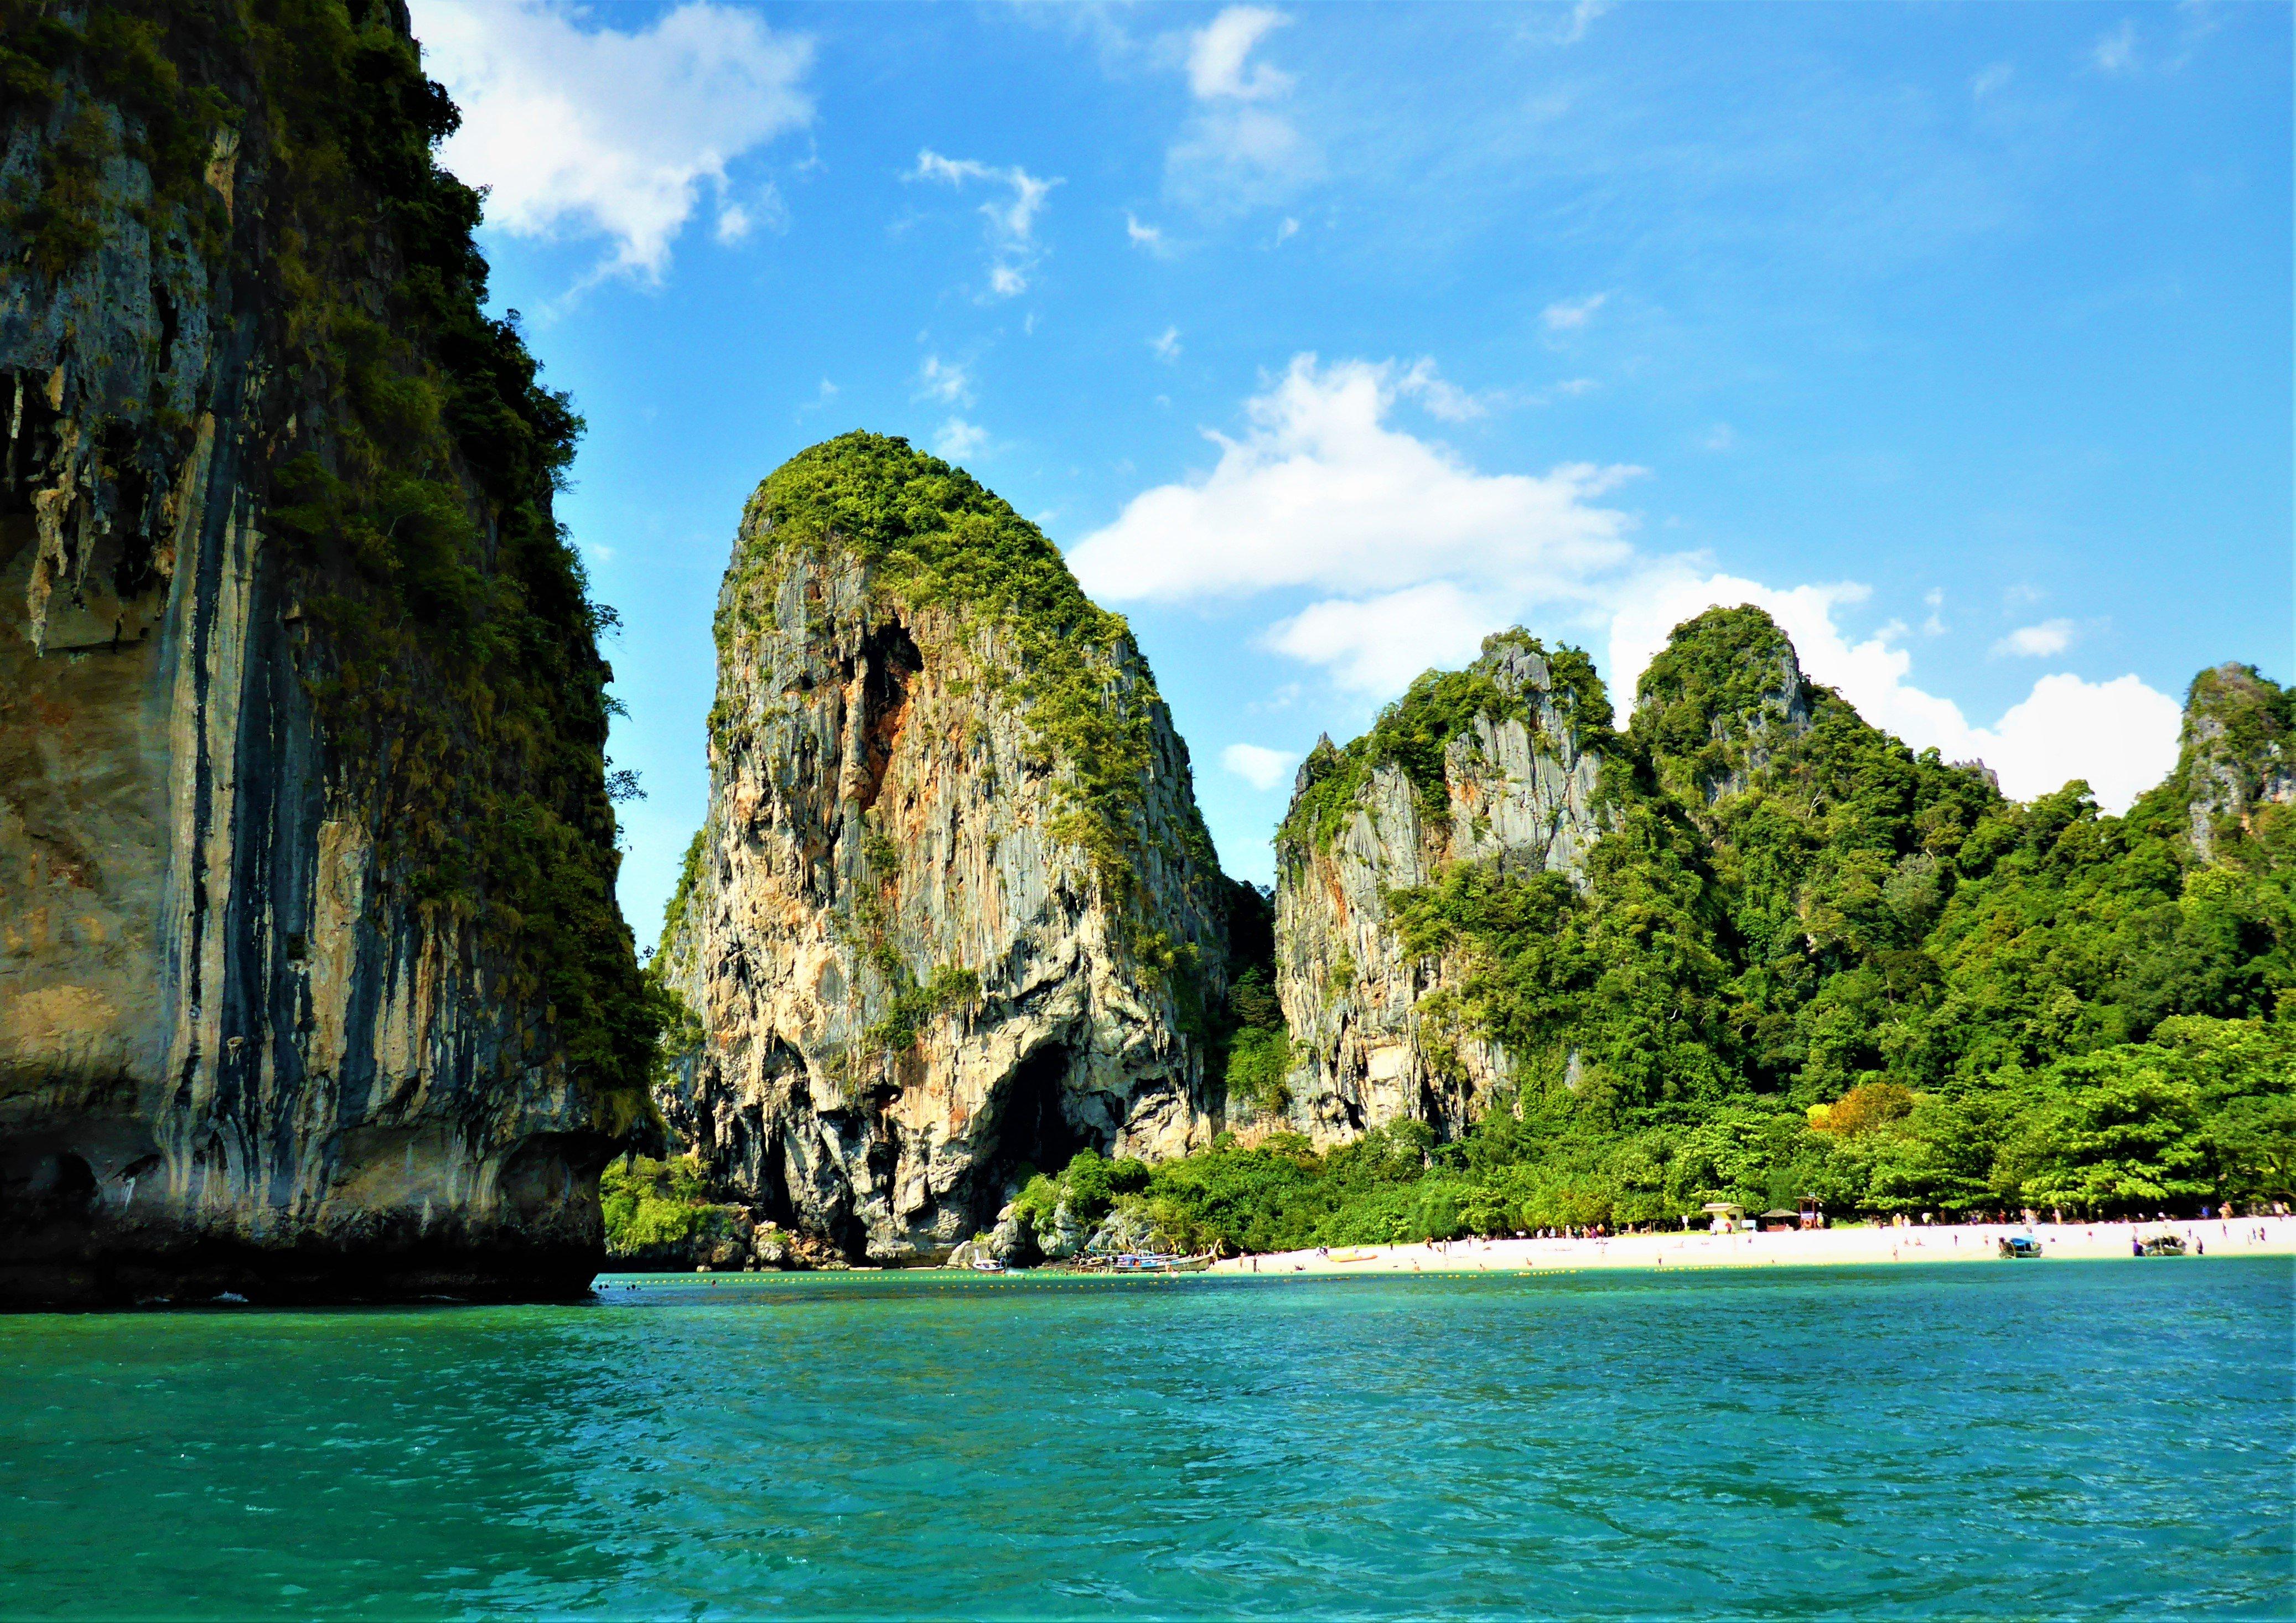 5 Leuke dingen om te doen in Krabi (Thailand)